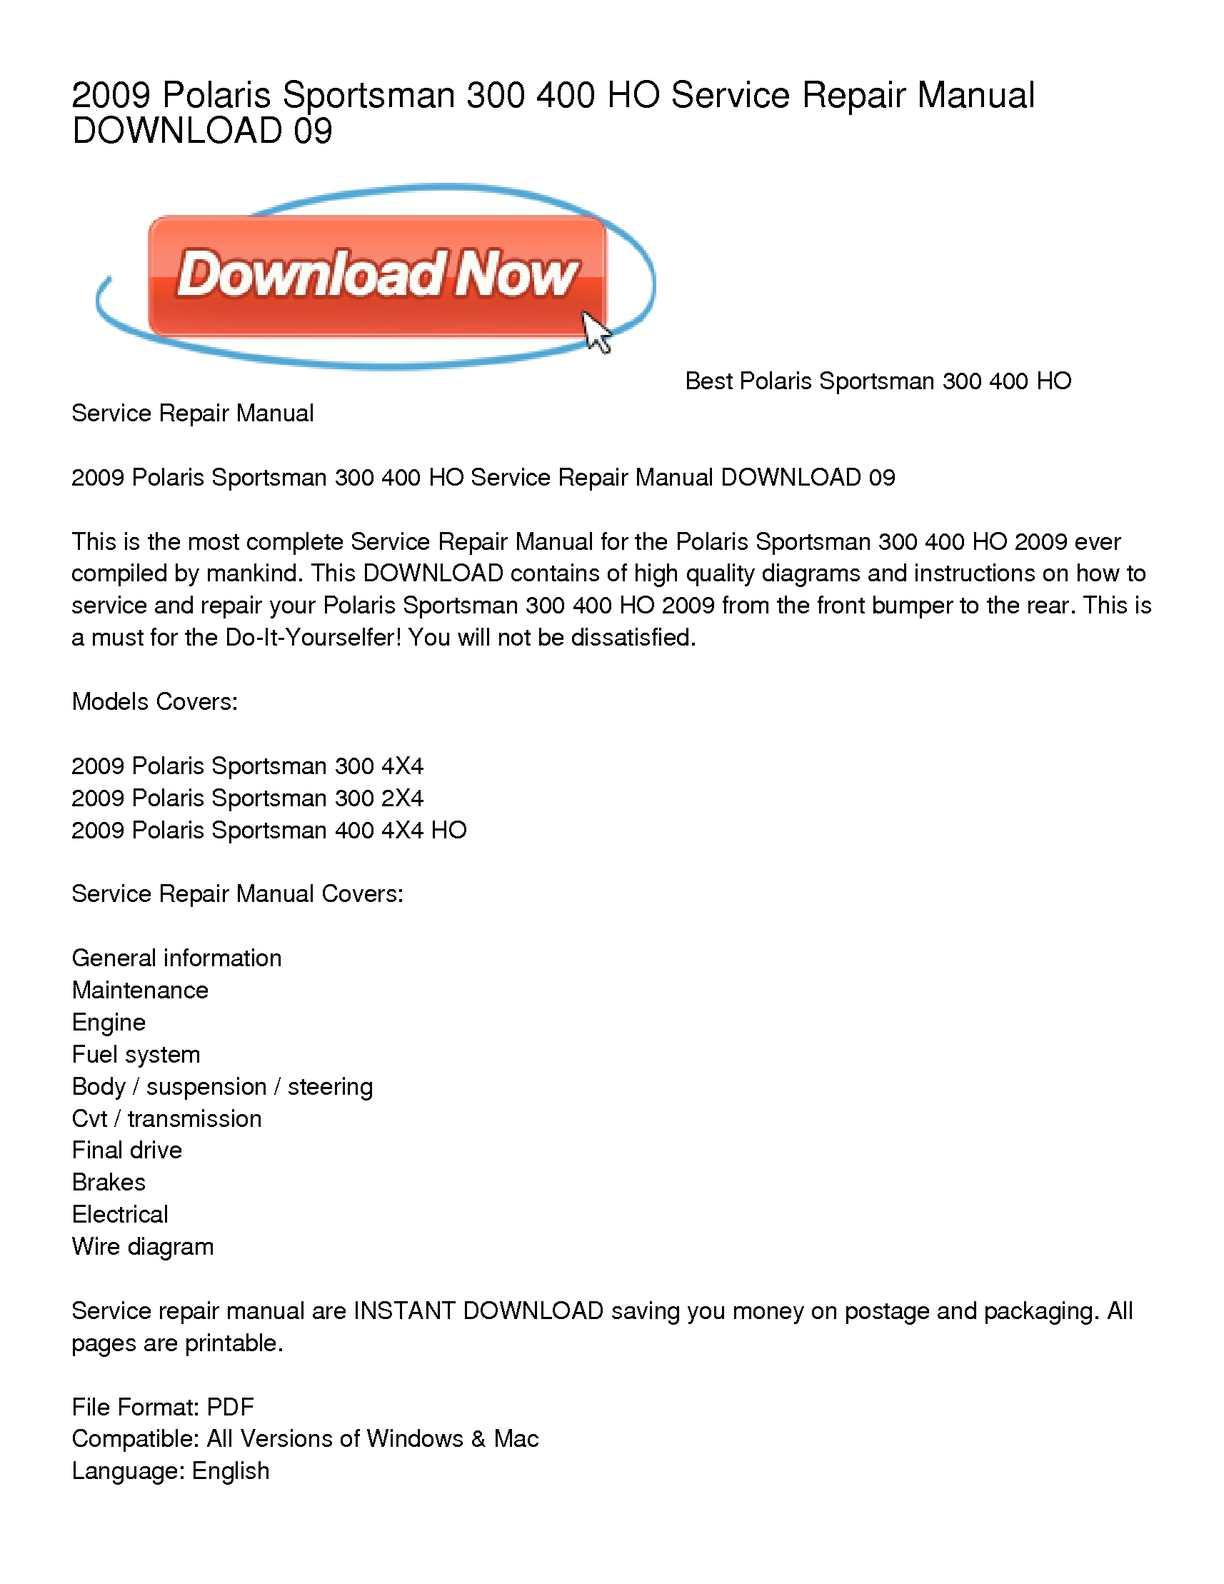 polaris ranger 400 ho service manual